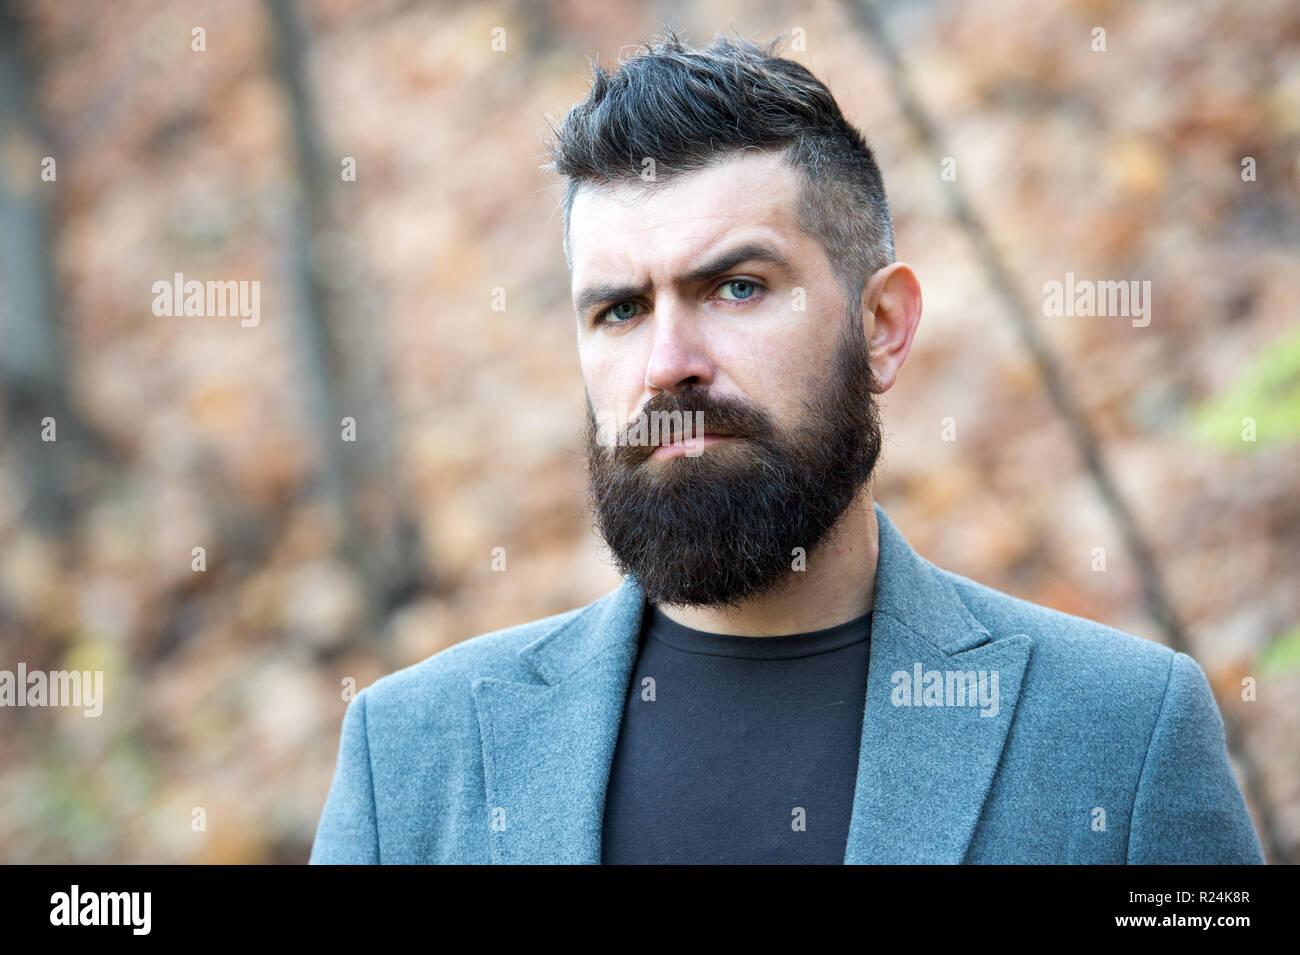 Hipster Apparence L Homme Elegant Manteau A La Mode Hipster Barbu Barbe Et Moustache Elegante De